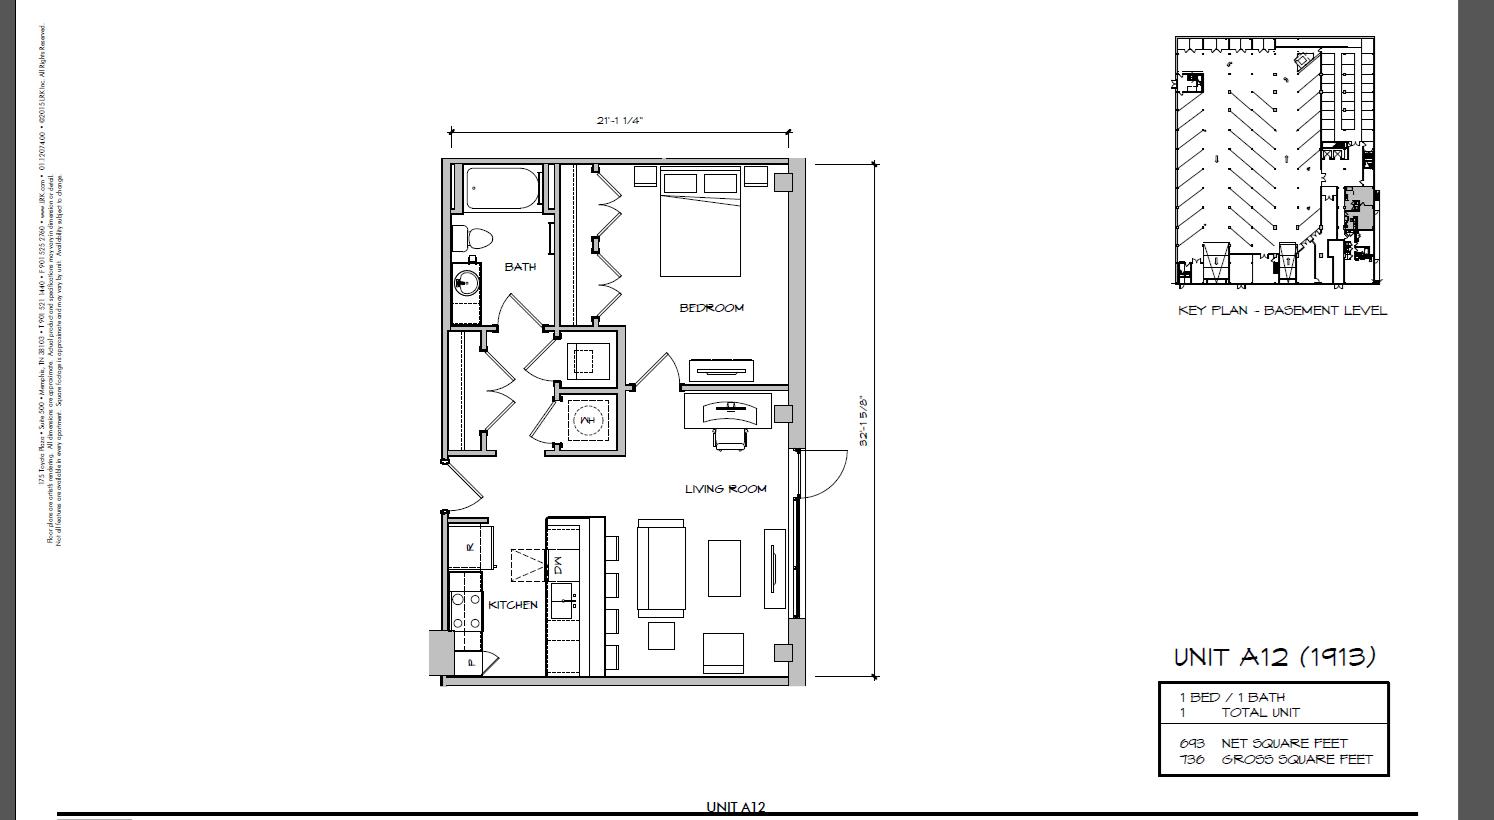 A12 - 1913 Floor Plan 1